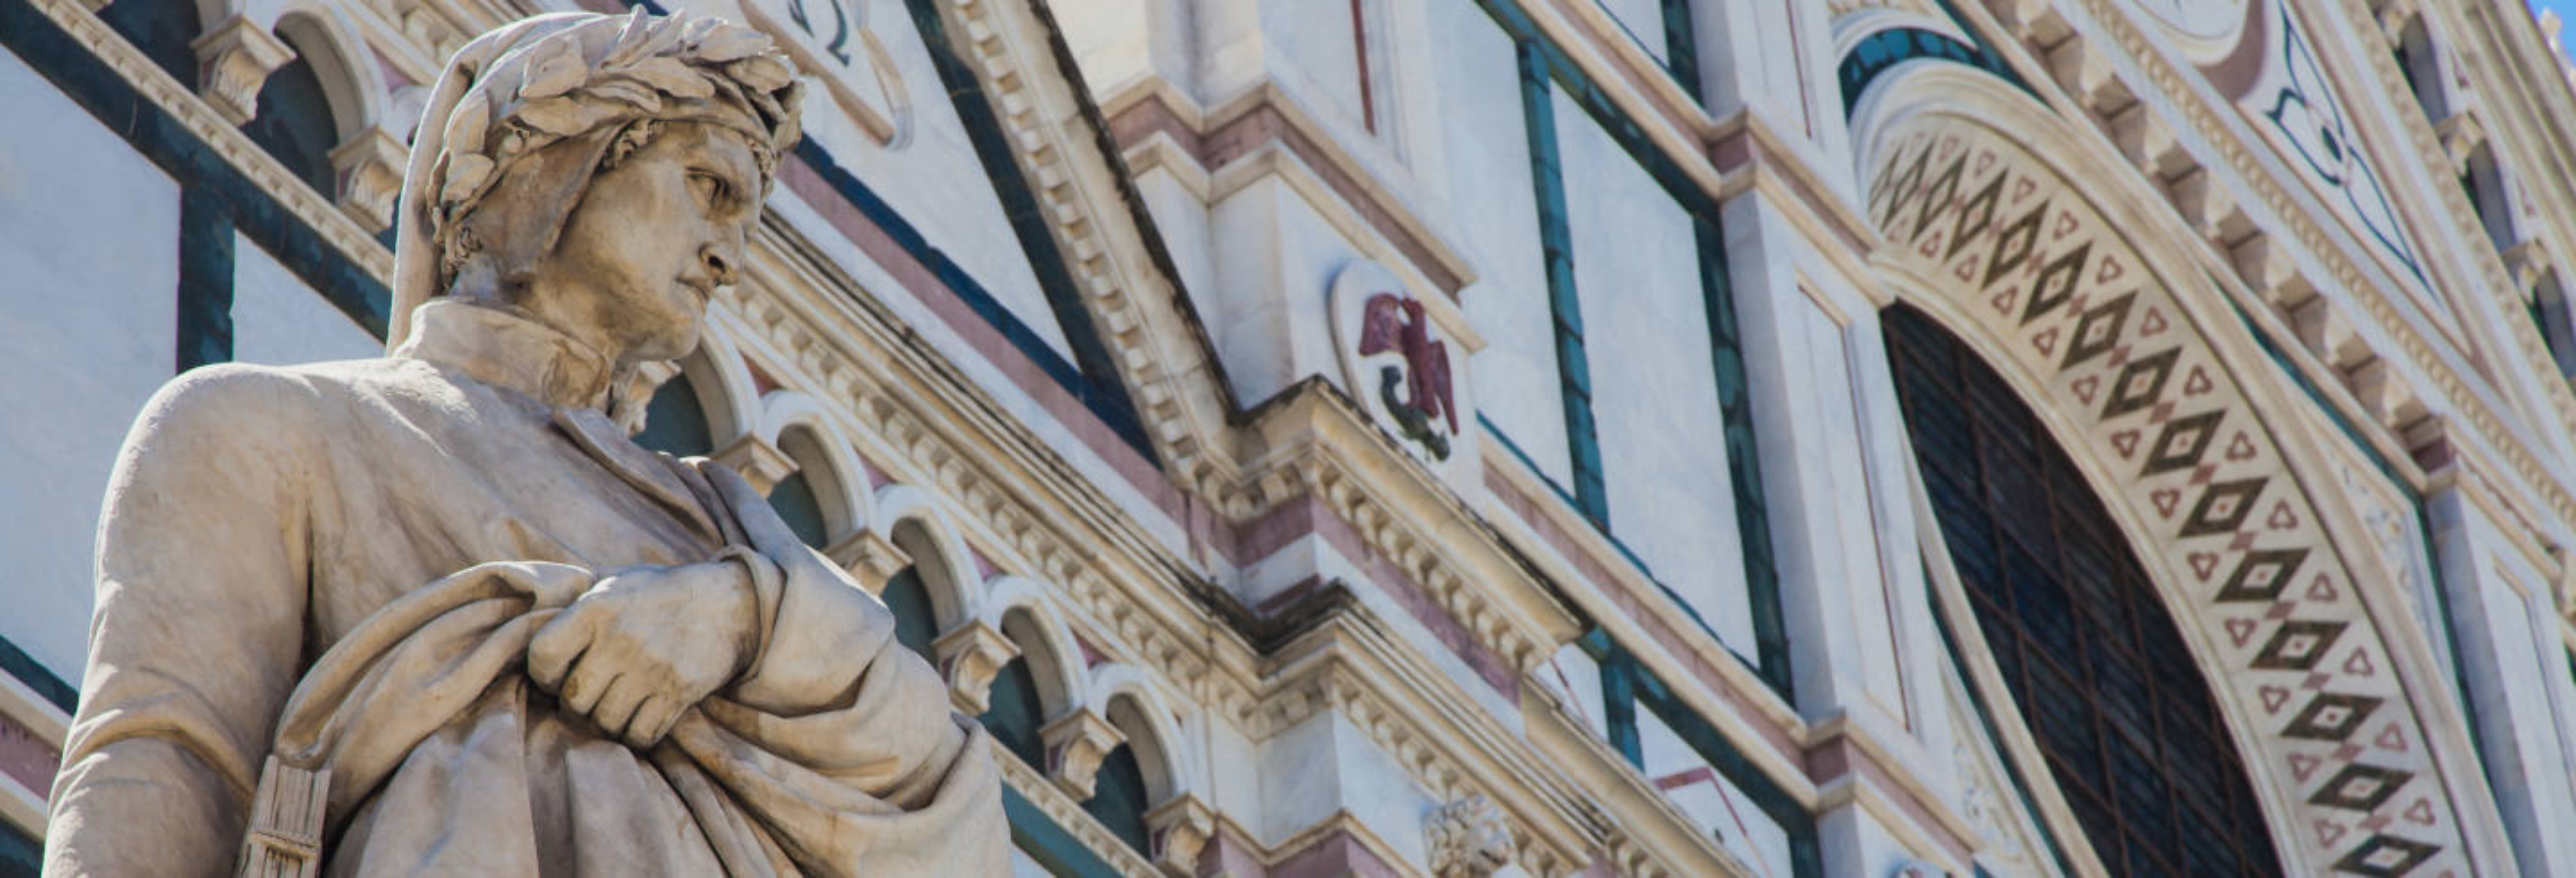 Visita guiada pela Basílica de Santa Croce